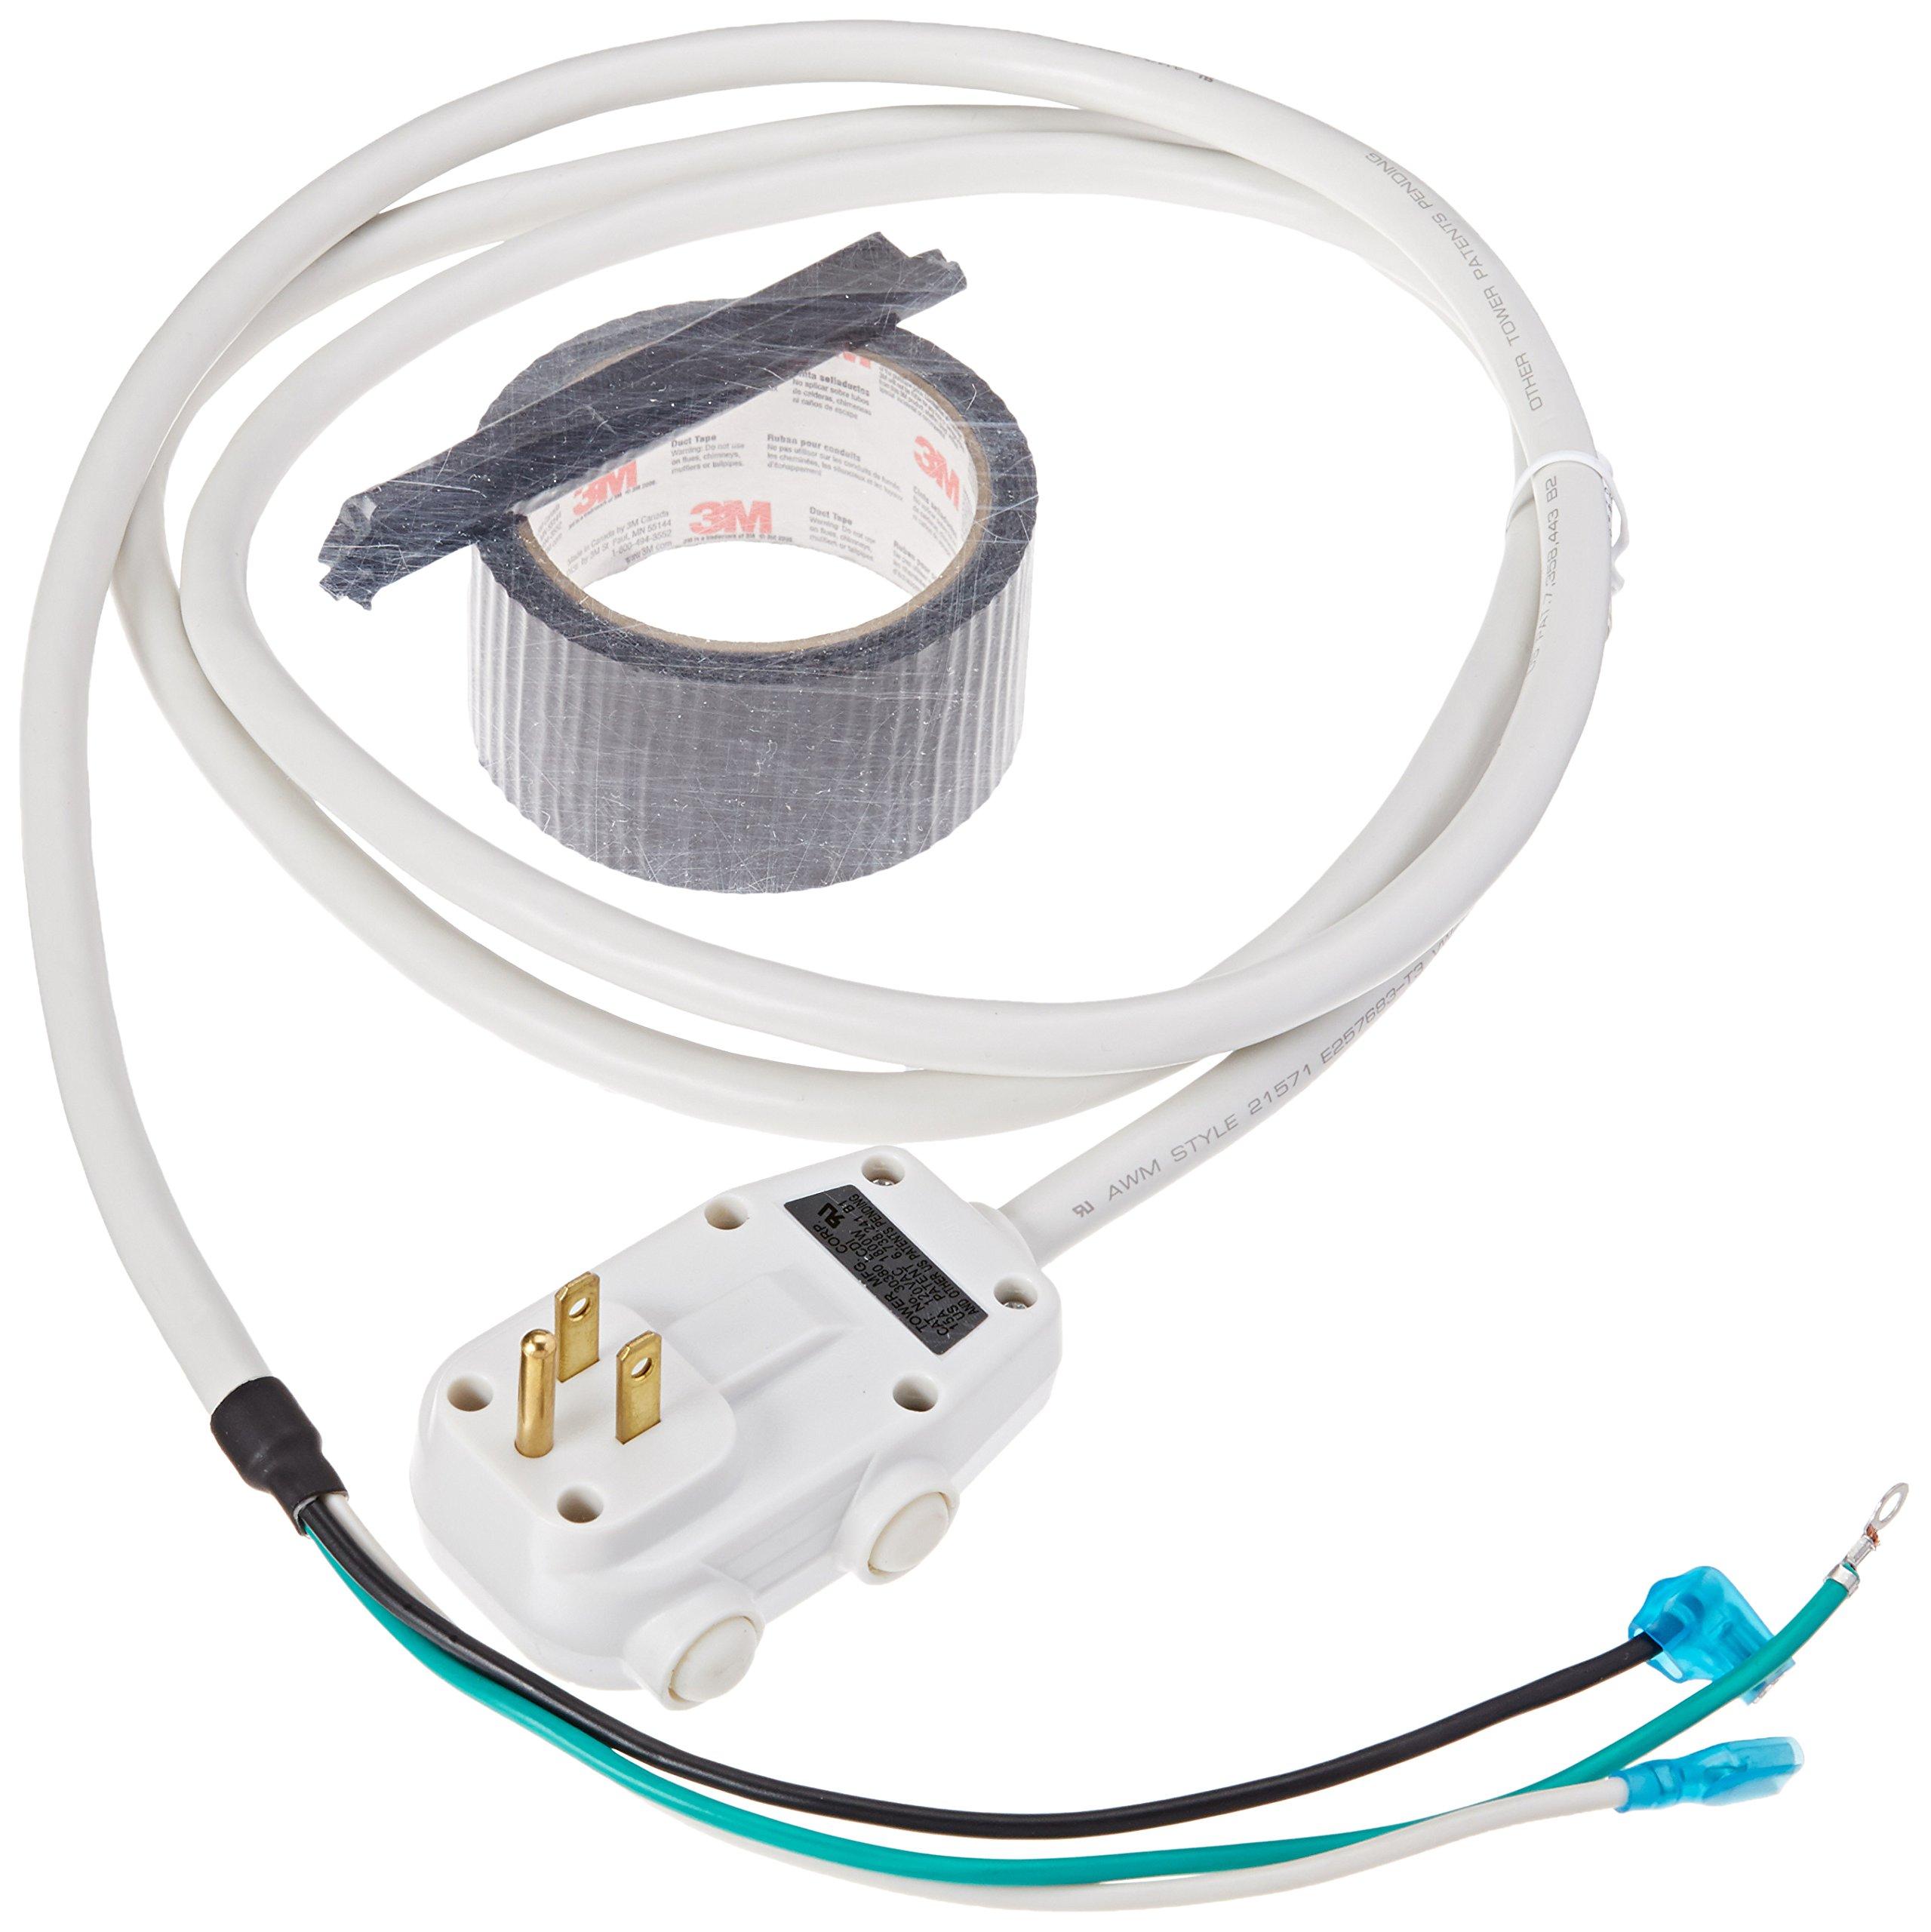 Frigidaire 5304459120 Air Conditioner Power Cord